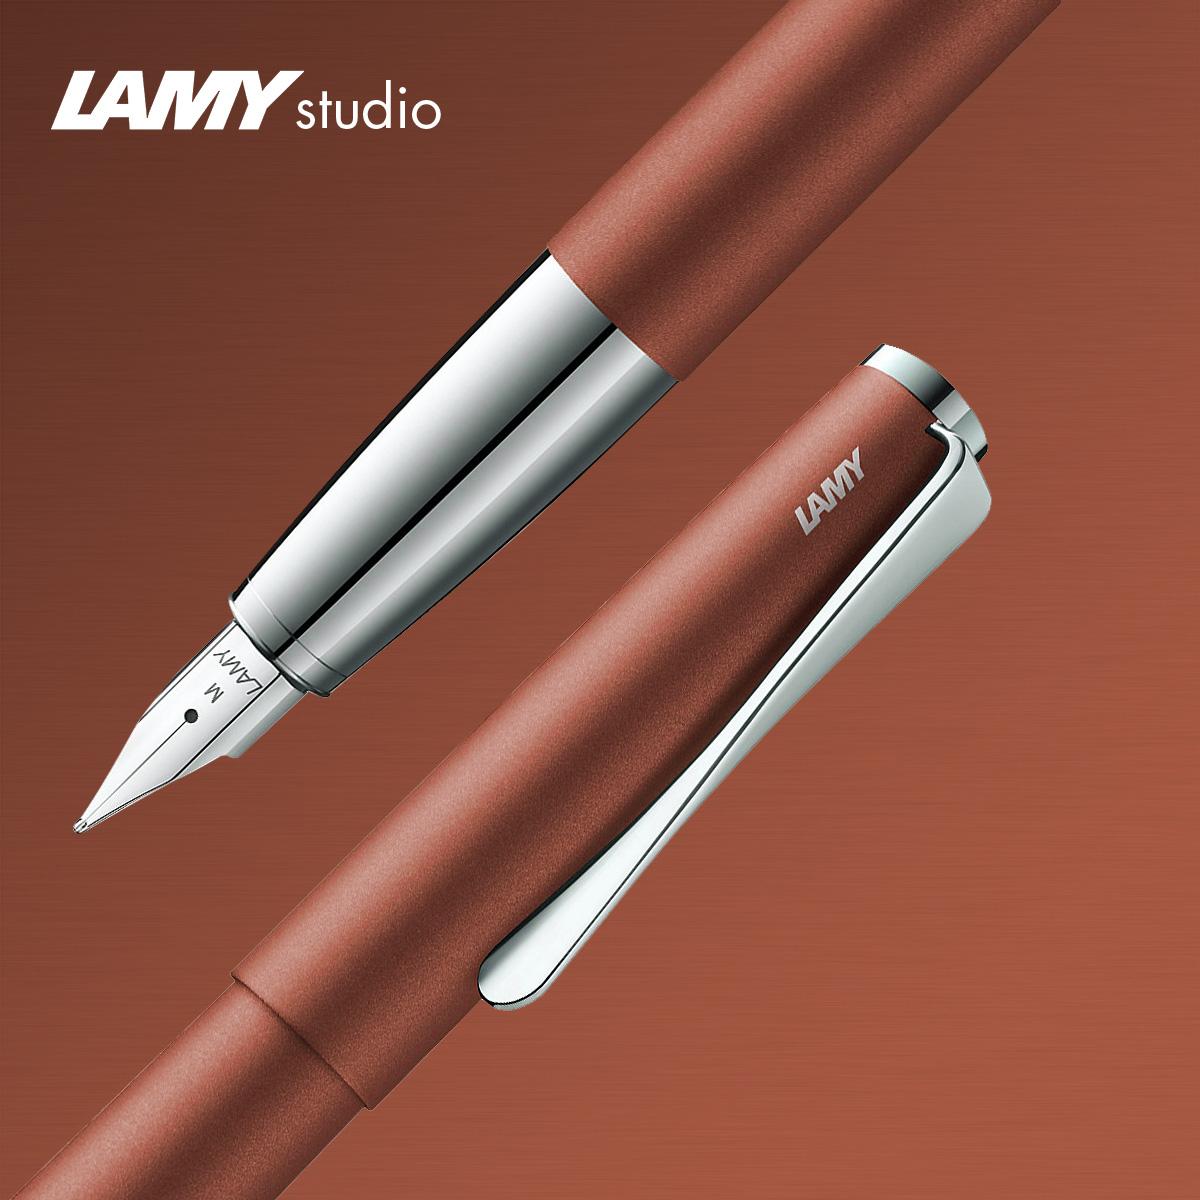 Lamy studio-terracotta.jpg